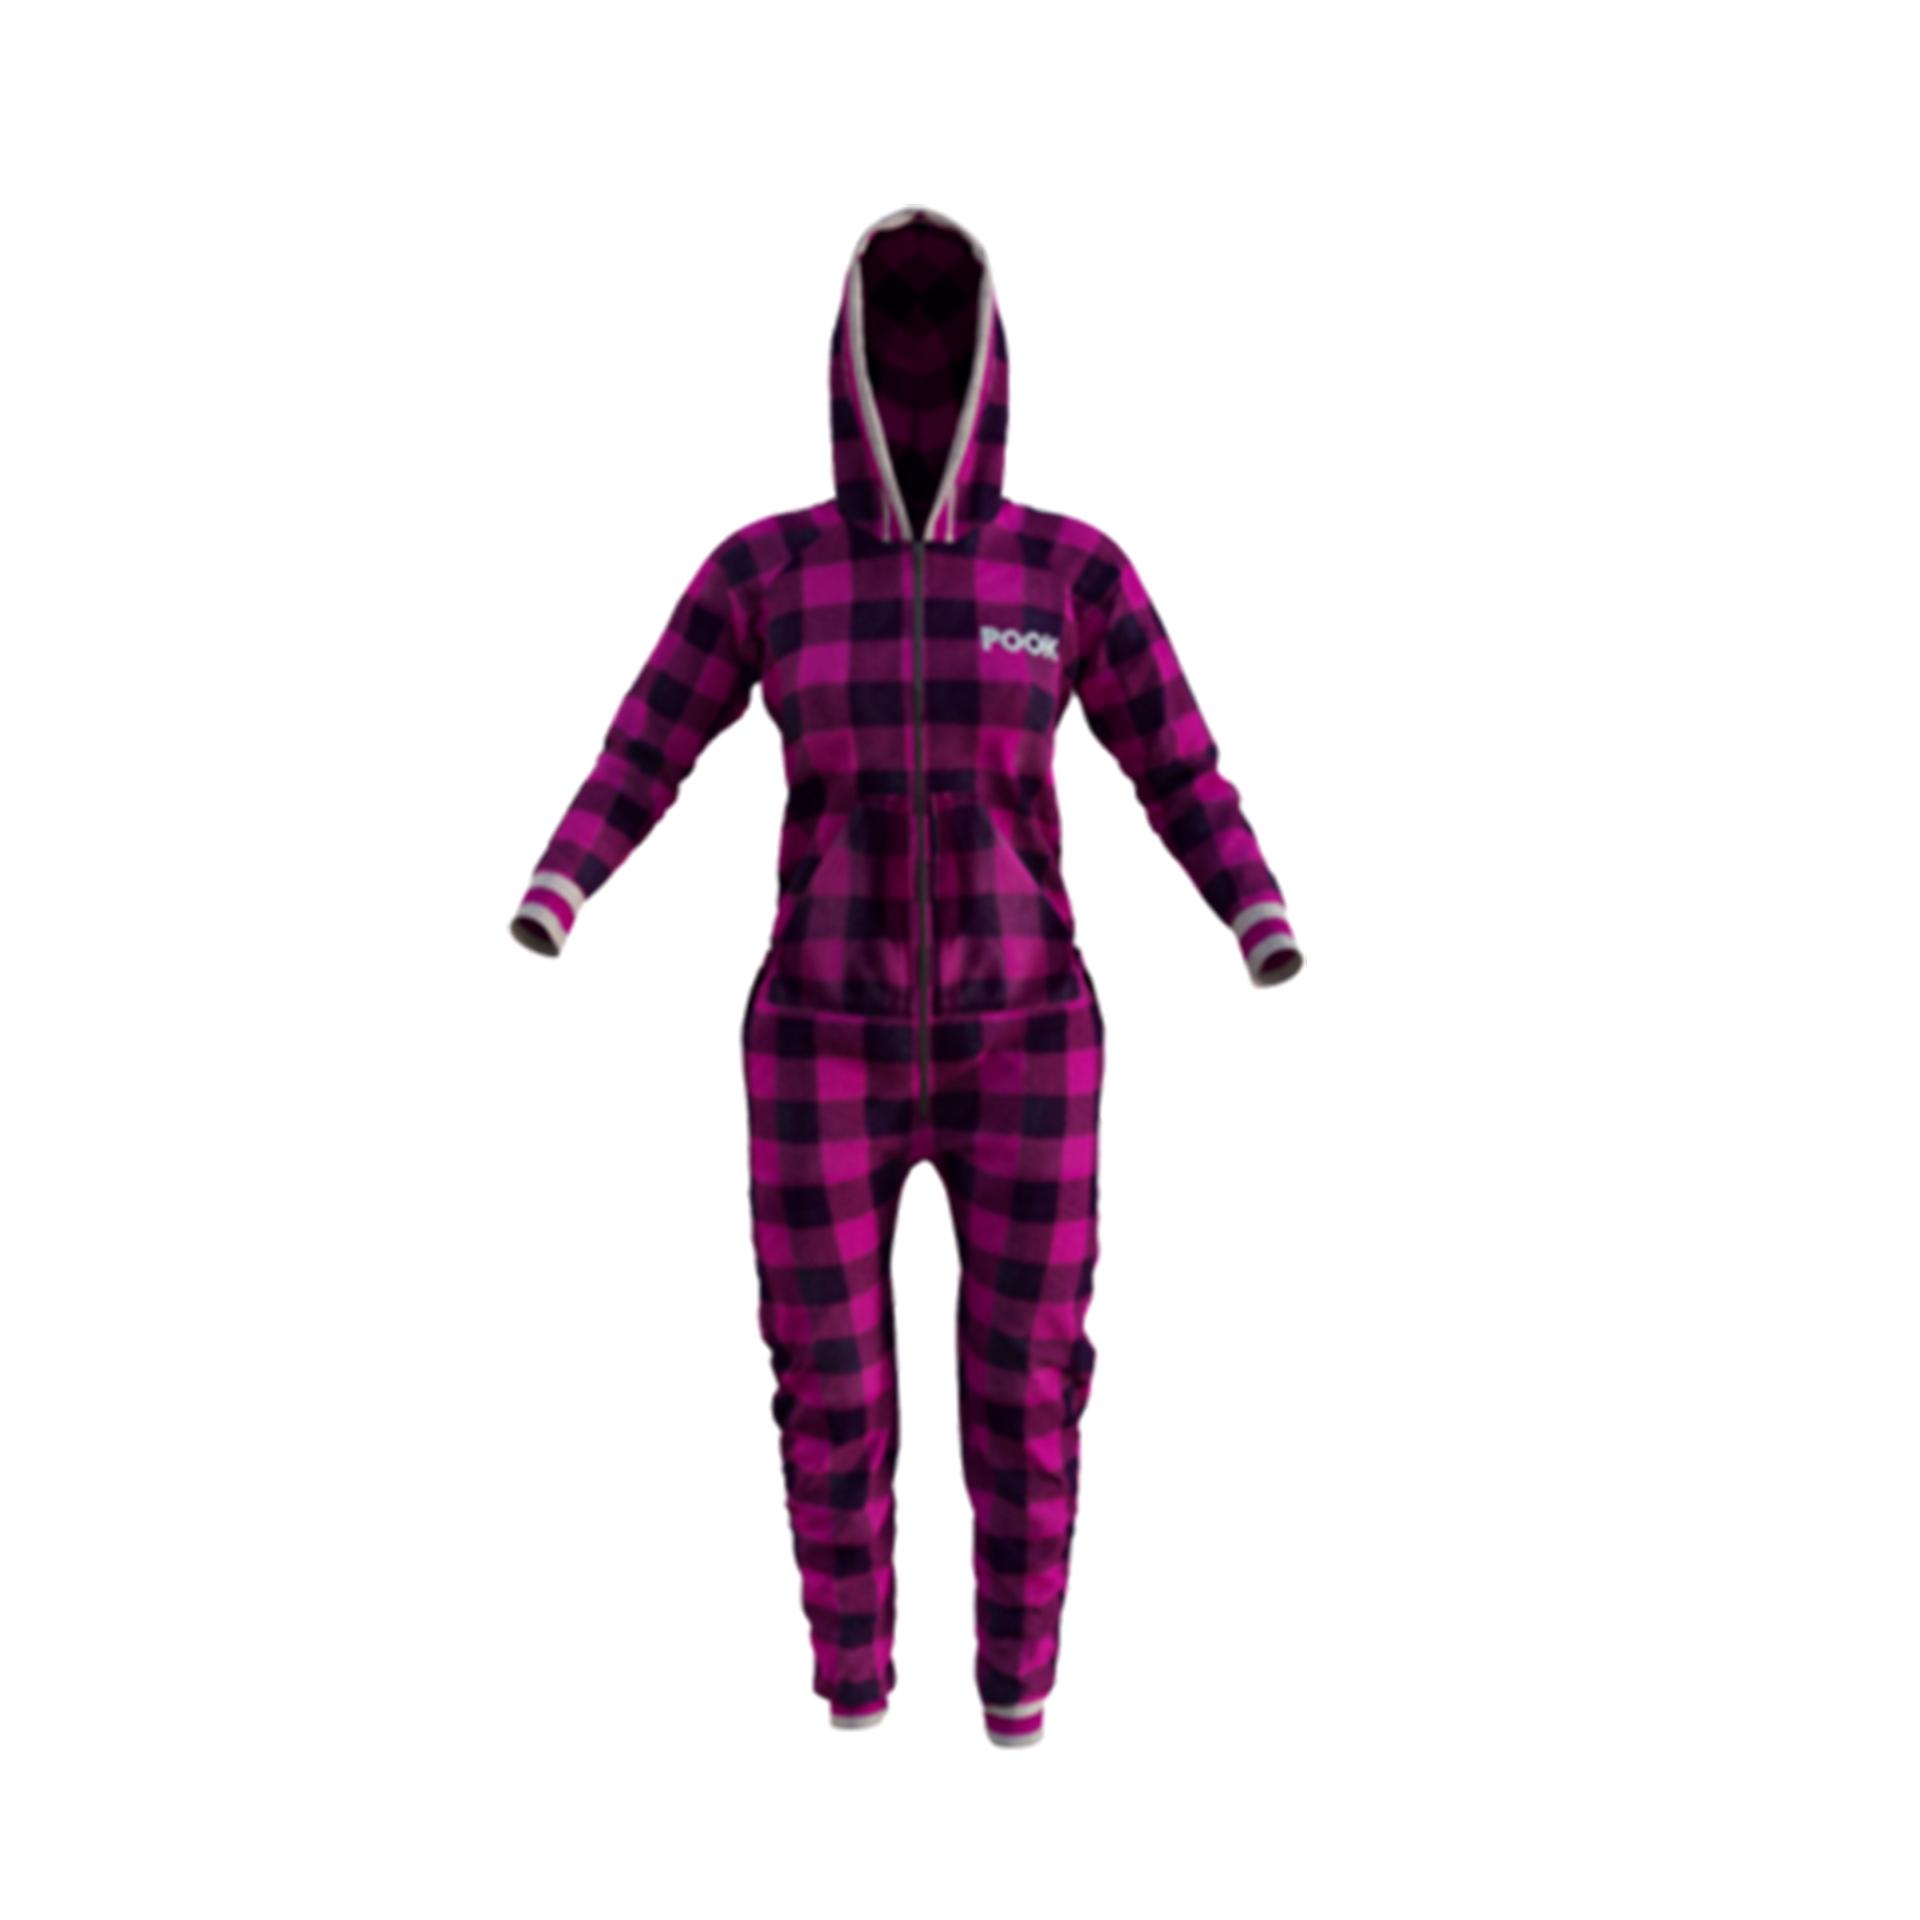 Pyjama Unisexe Pook